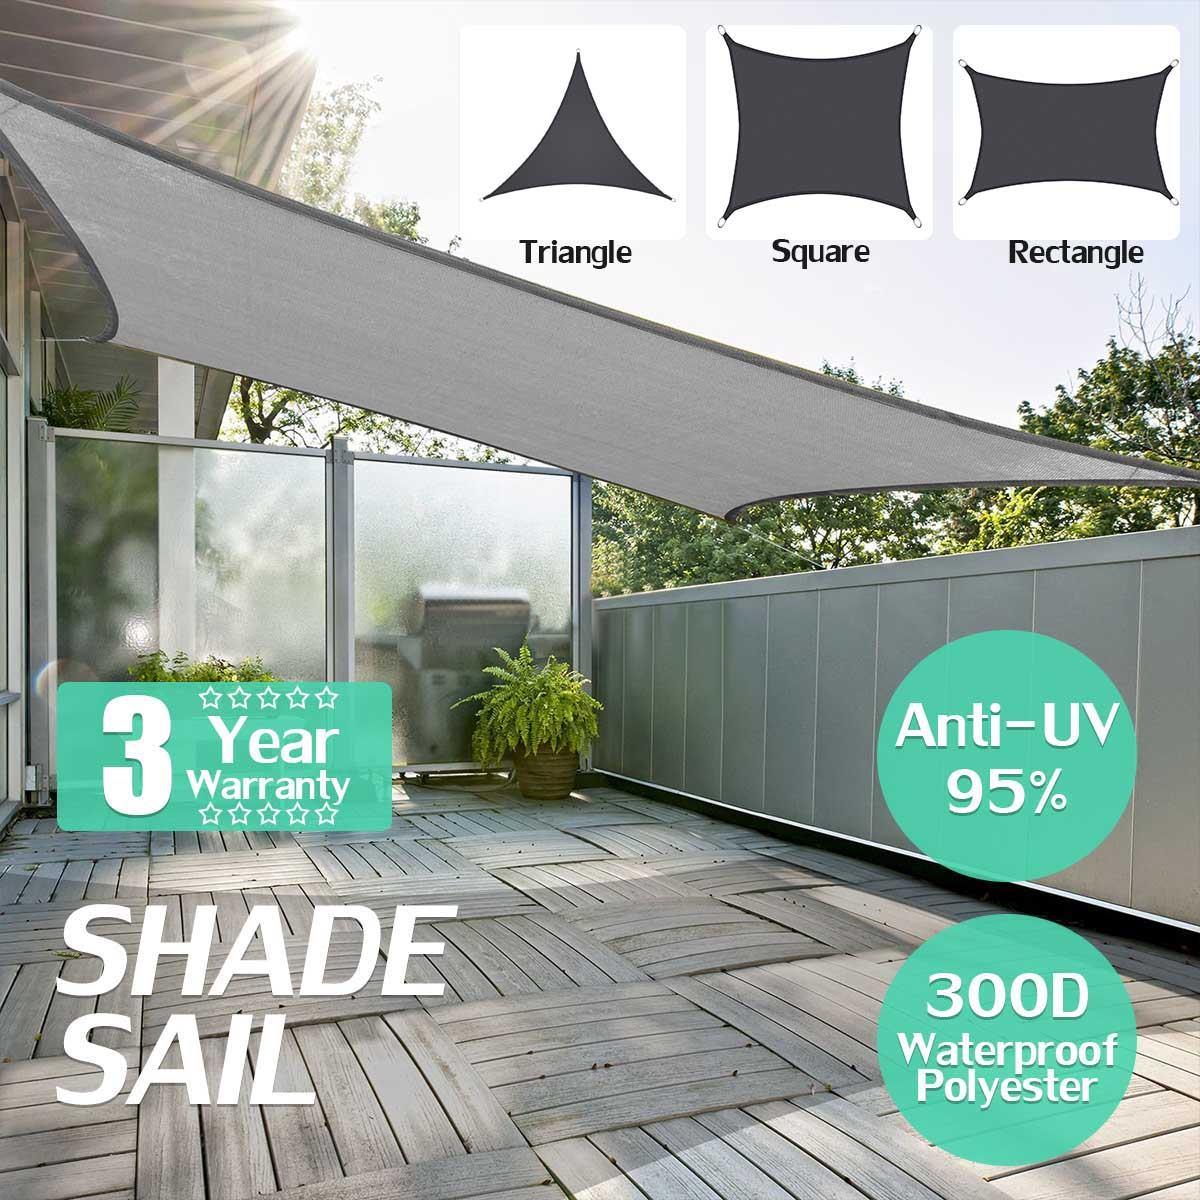 Negro púrpura tamaño 300D sol sombra navegar en casa de jardín al aire libre impermeable Canopy planta del Patio cubierta toldo de sol sombra